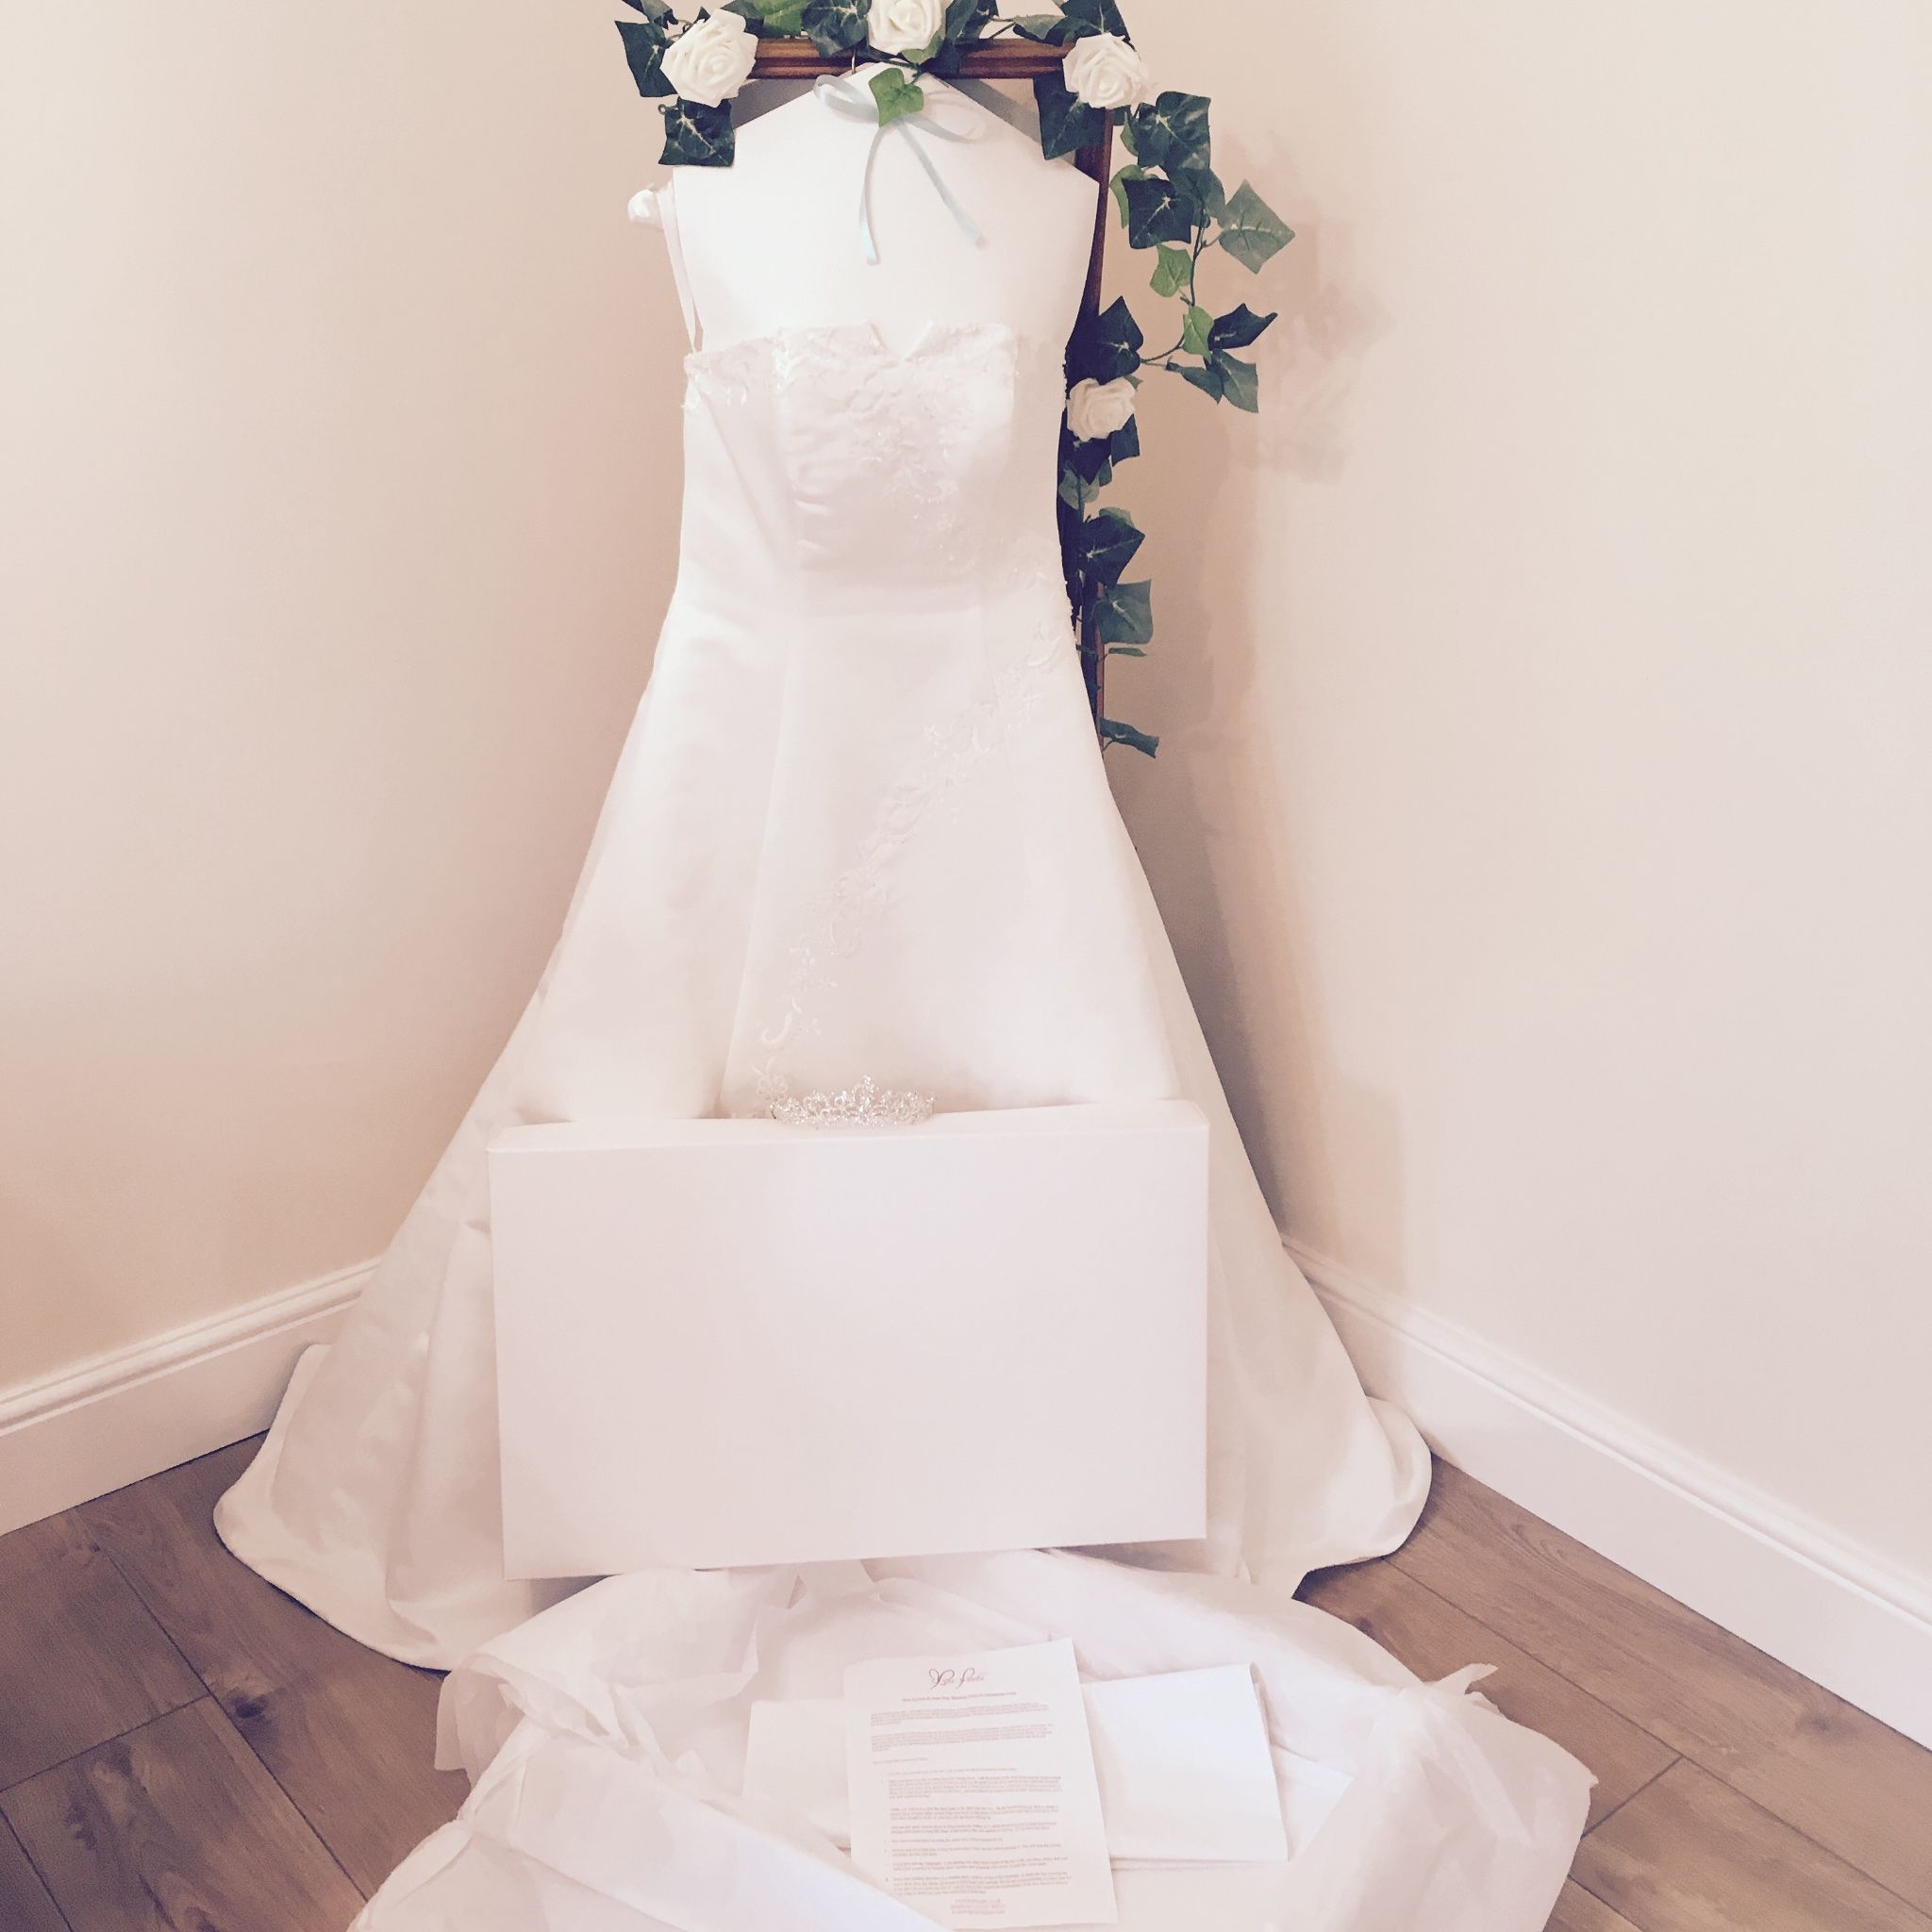 Wedding Gown Boxes: Wedding Dress Storage Preservation Box